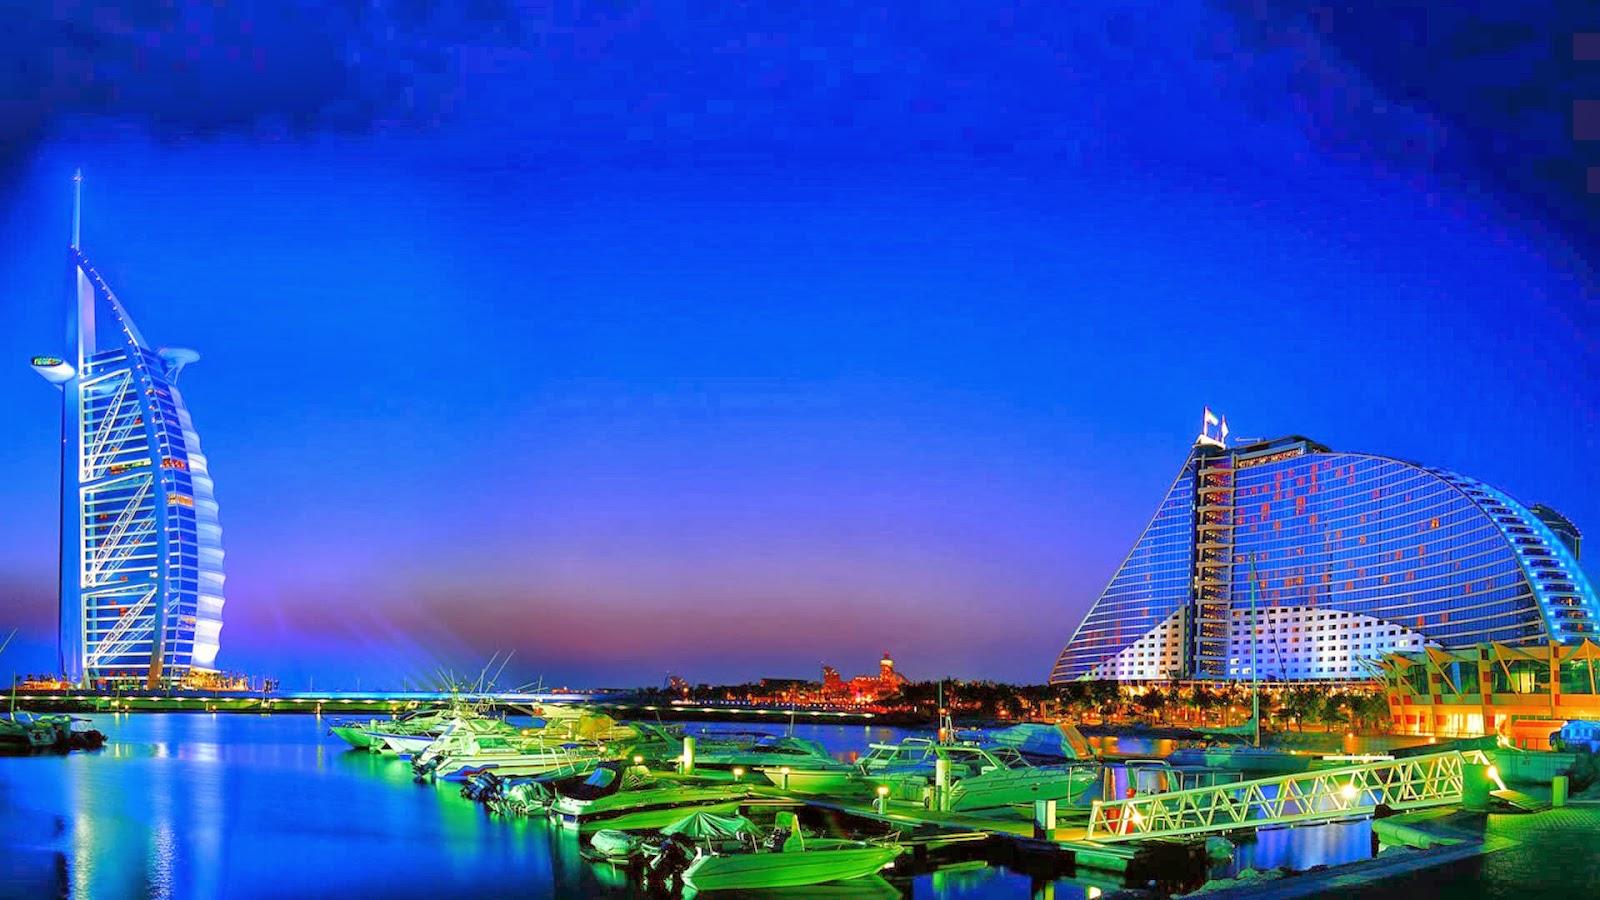 Pakistani Indian FM Radio: City 101 6 FM Dubai